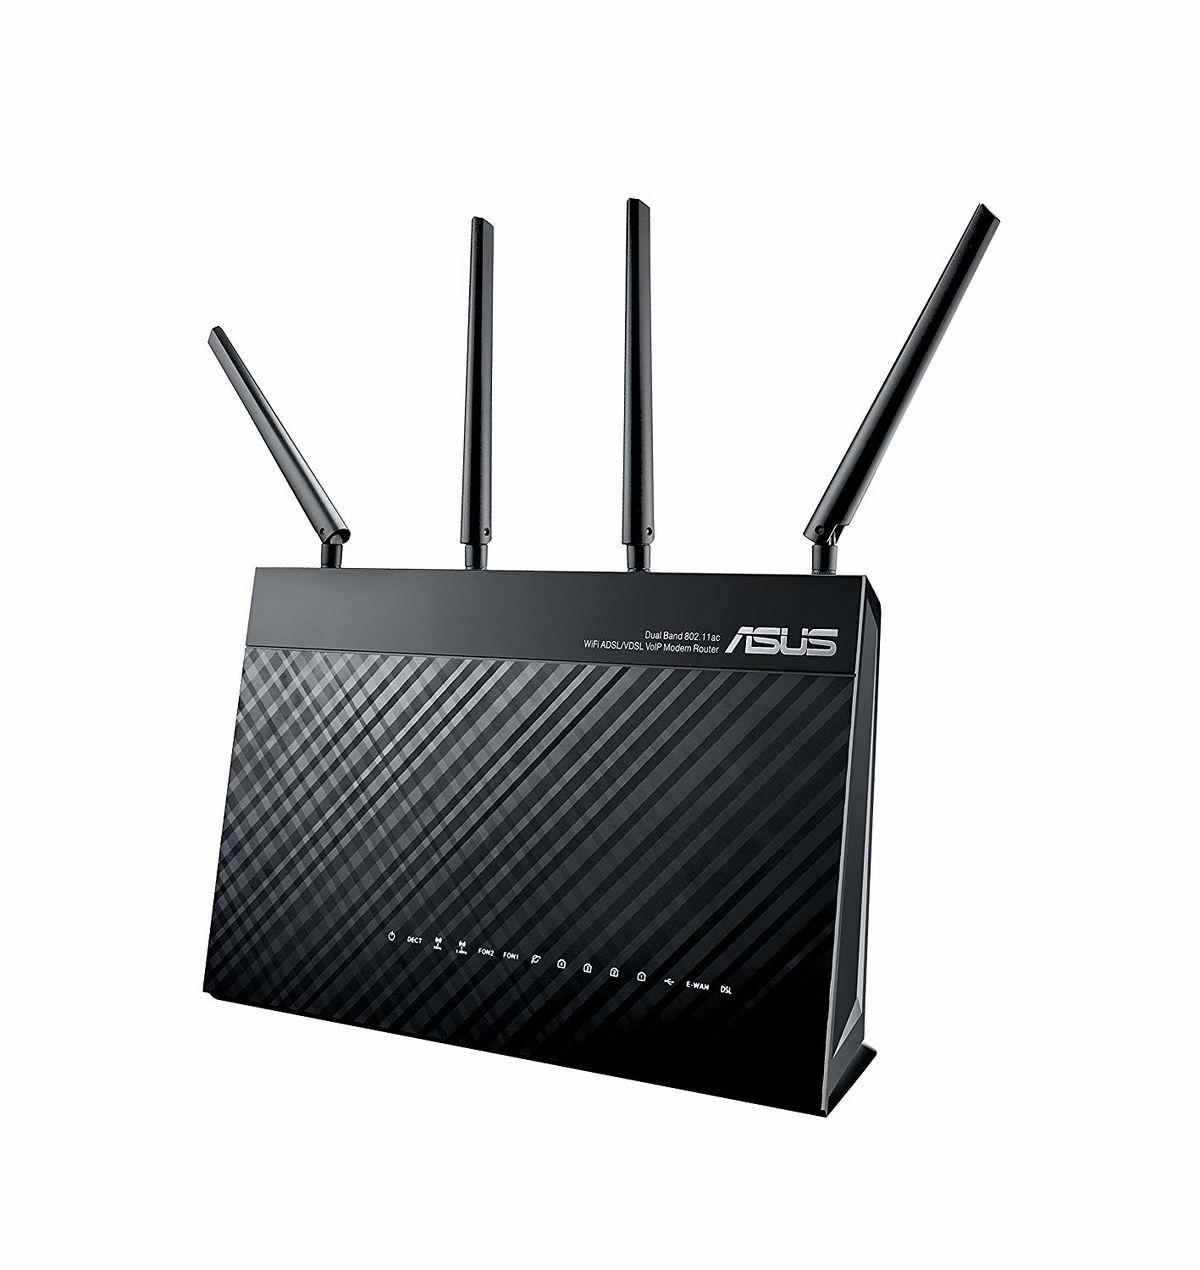 ASUS DSL-AC87VG - TechInfoDepot